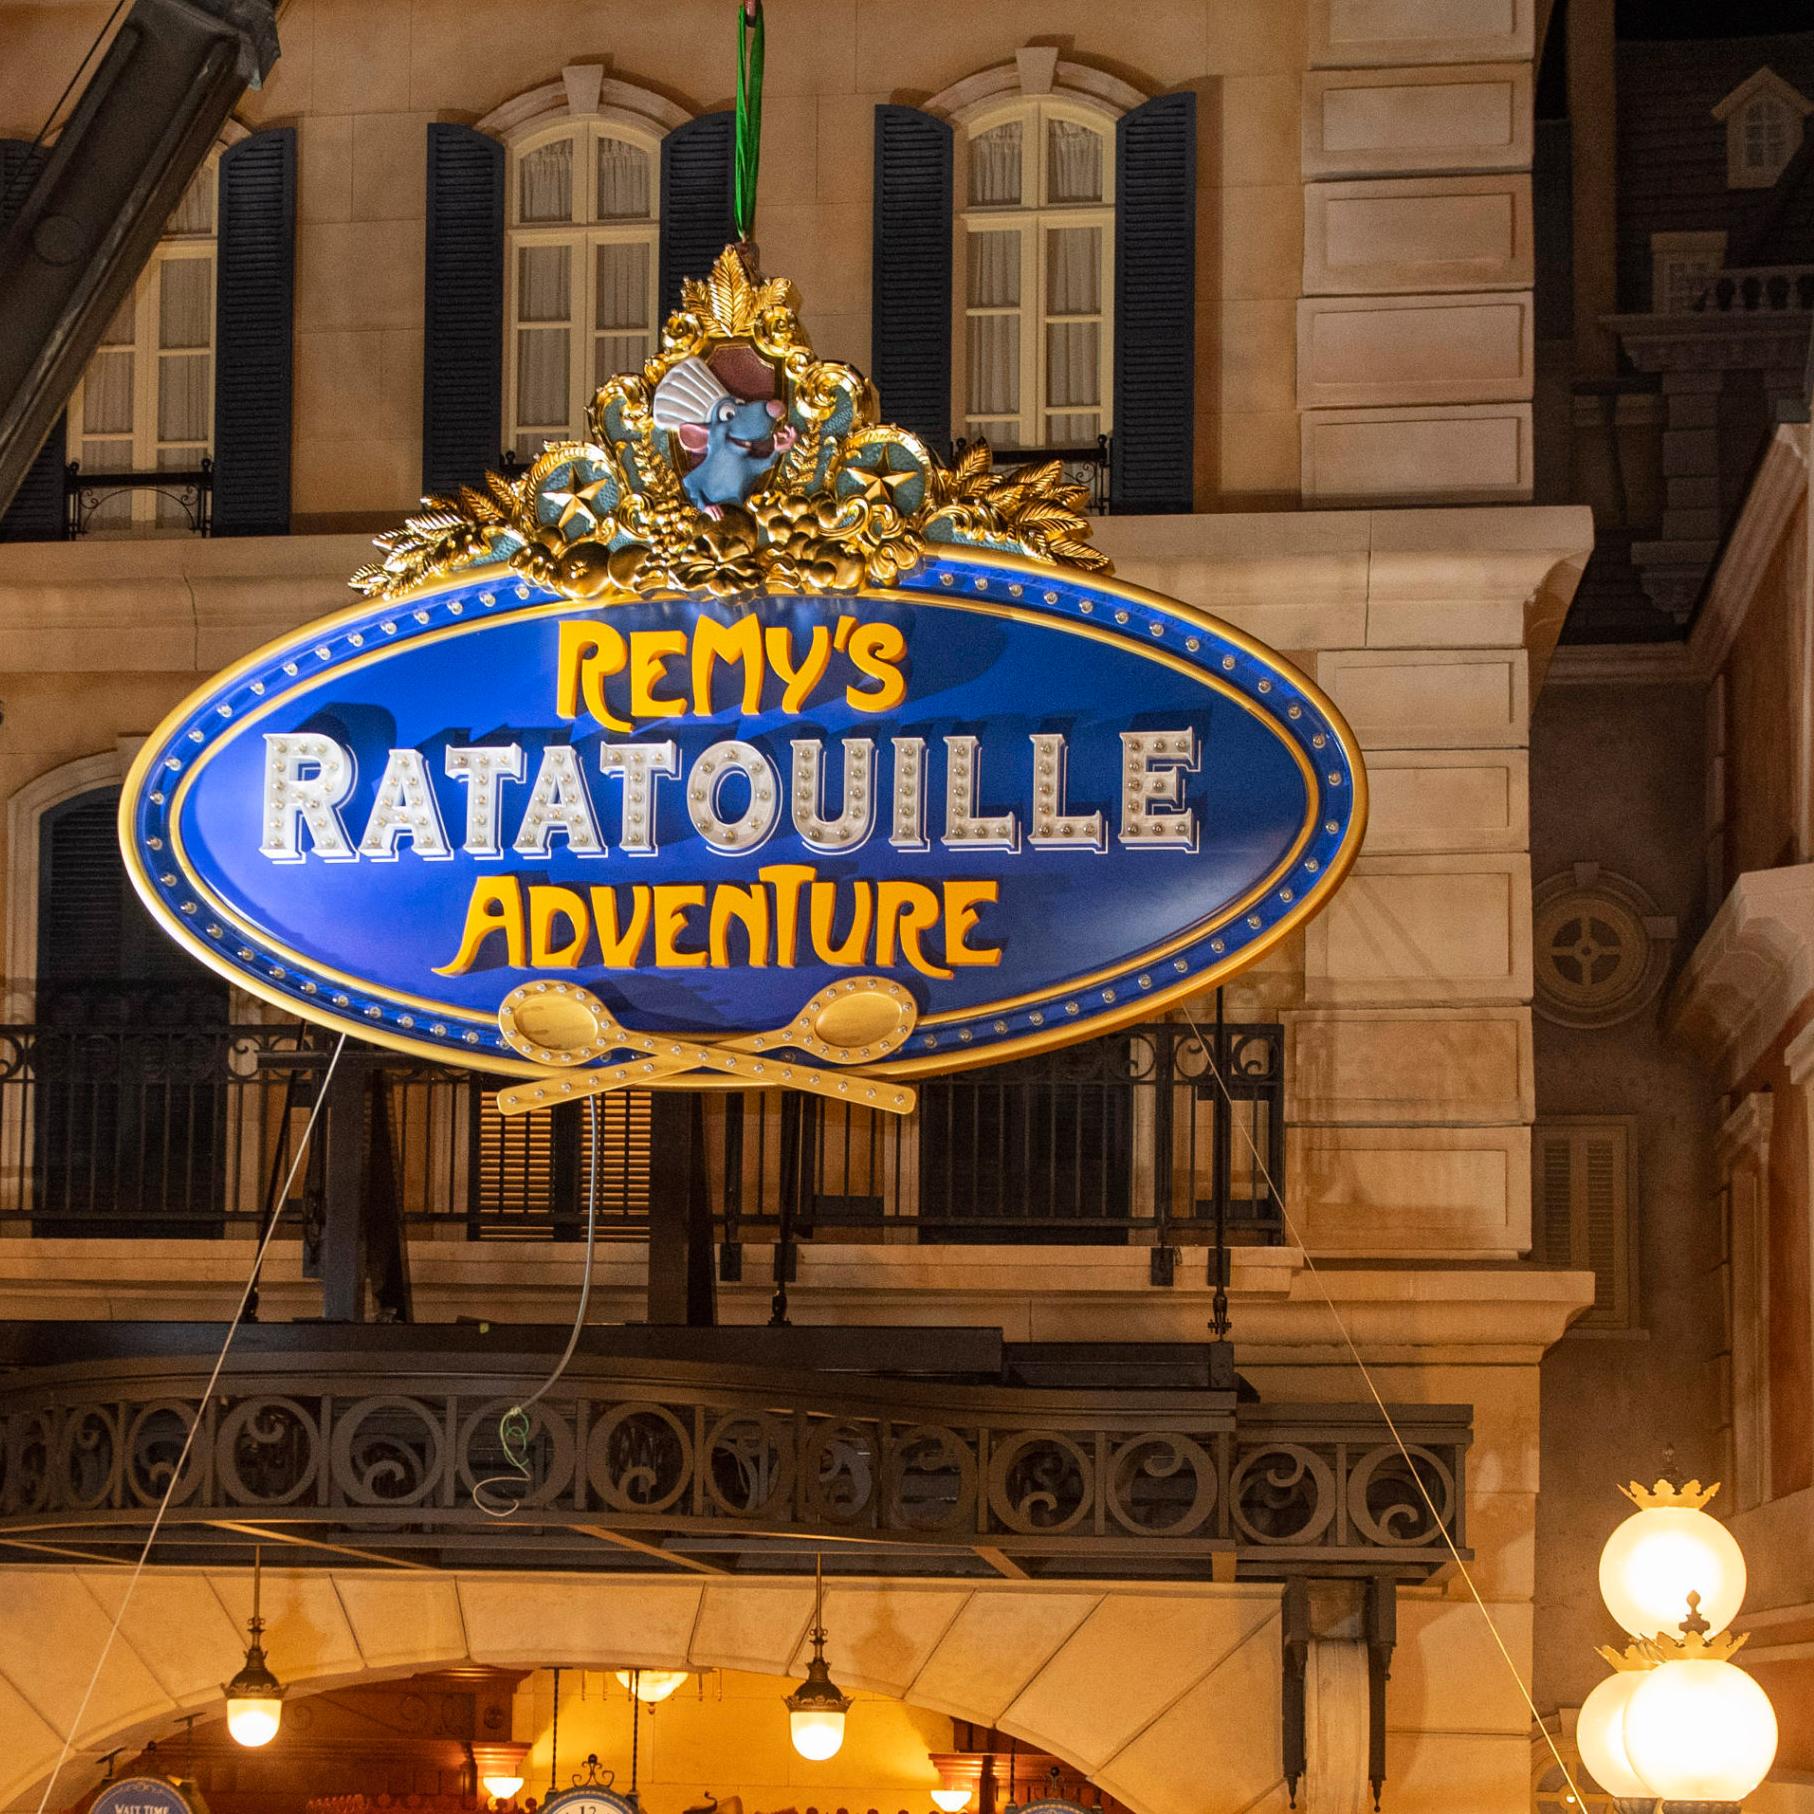 Remy's Ratatouille Adventure at Epcot.